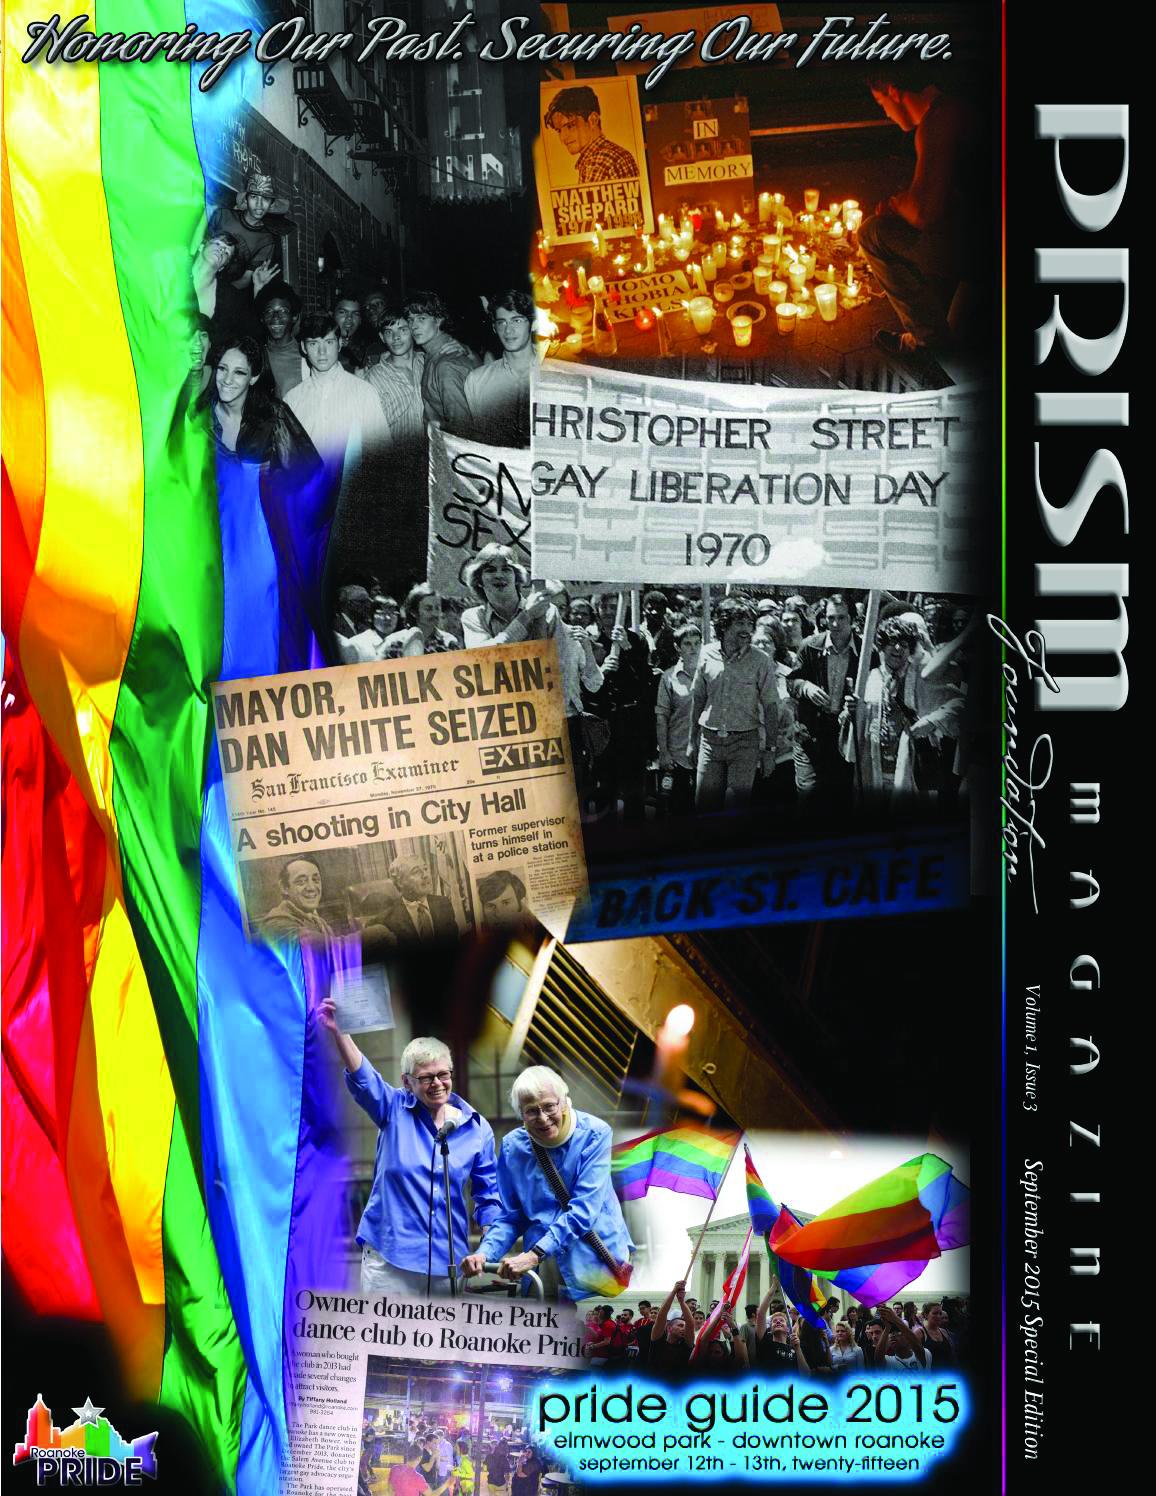 prism magazine cover 2.jpg